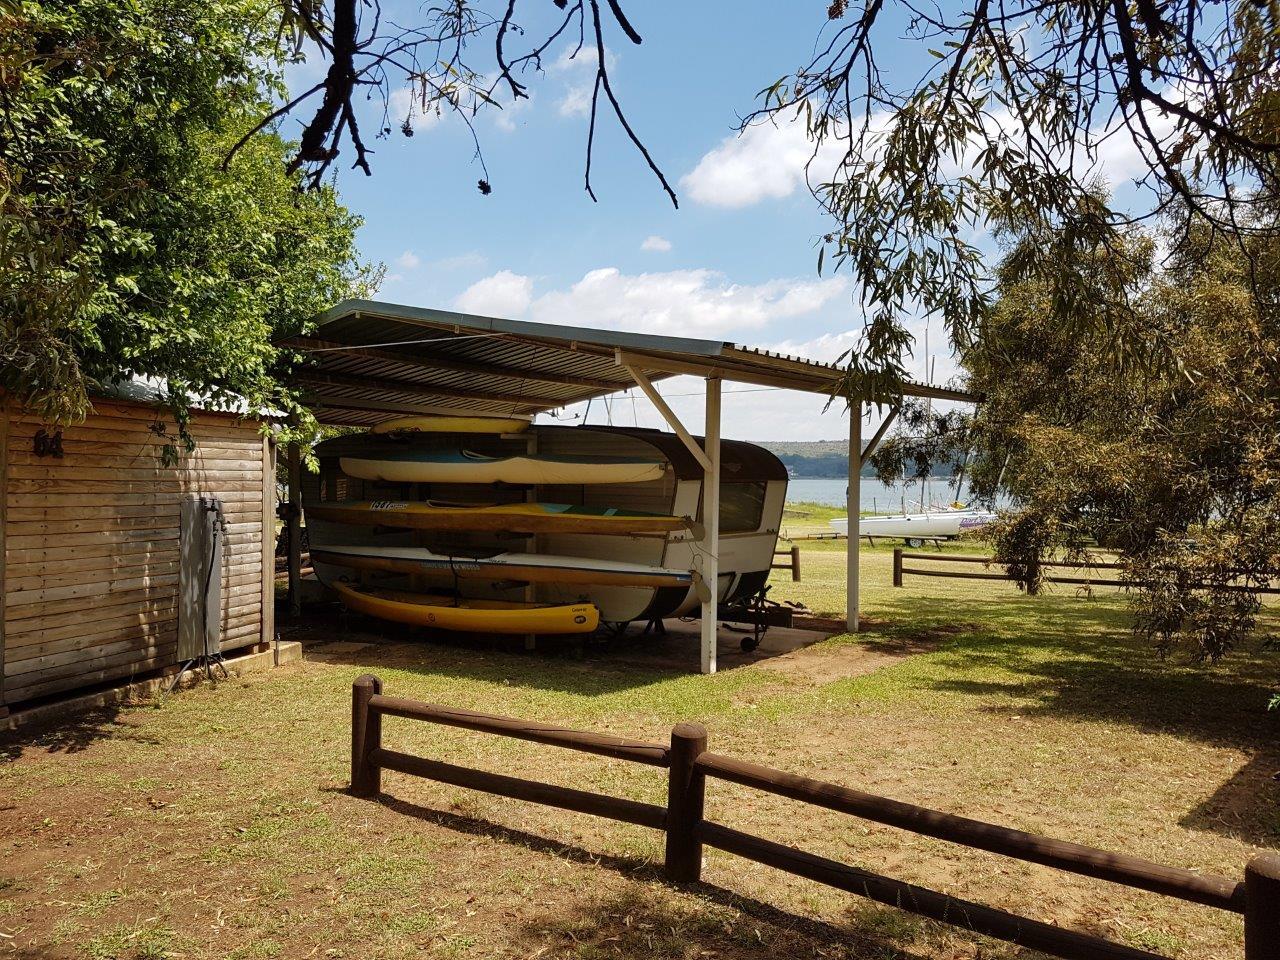 Caravan/camp site for sale